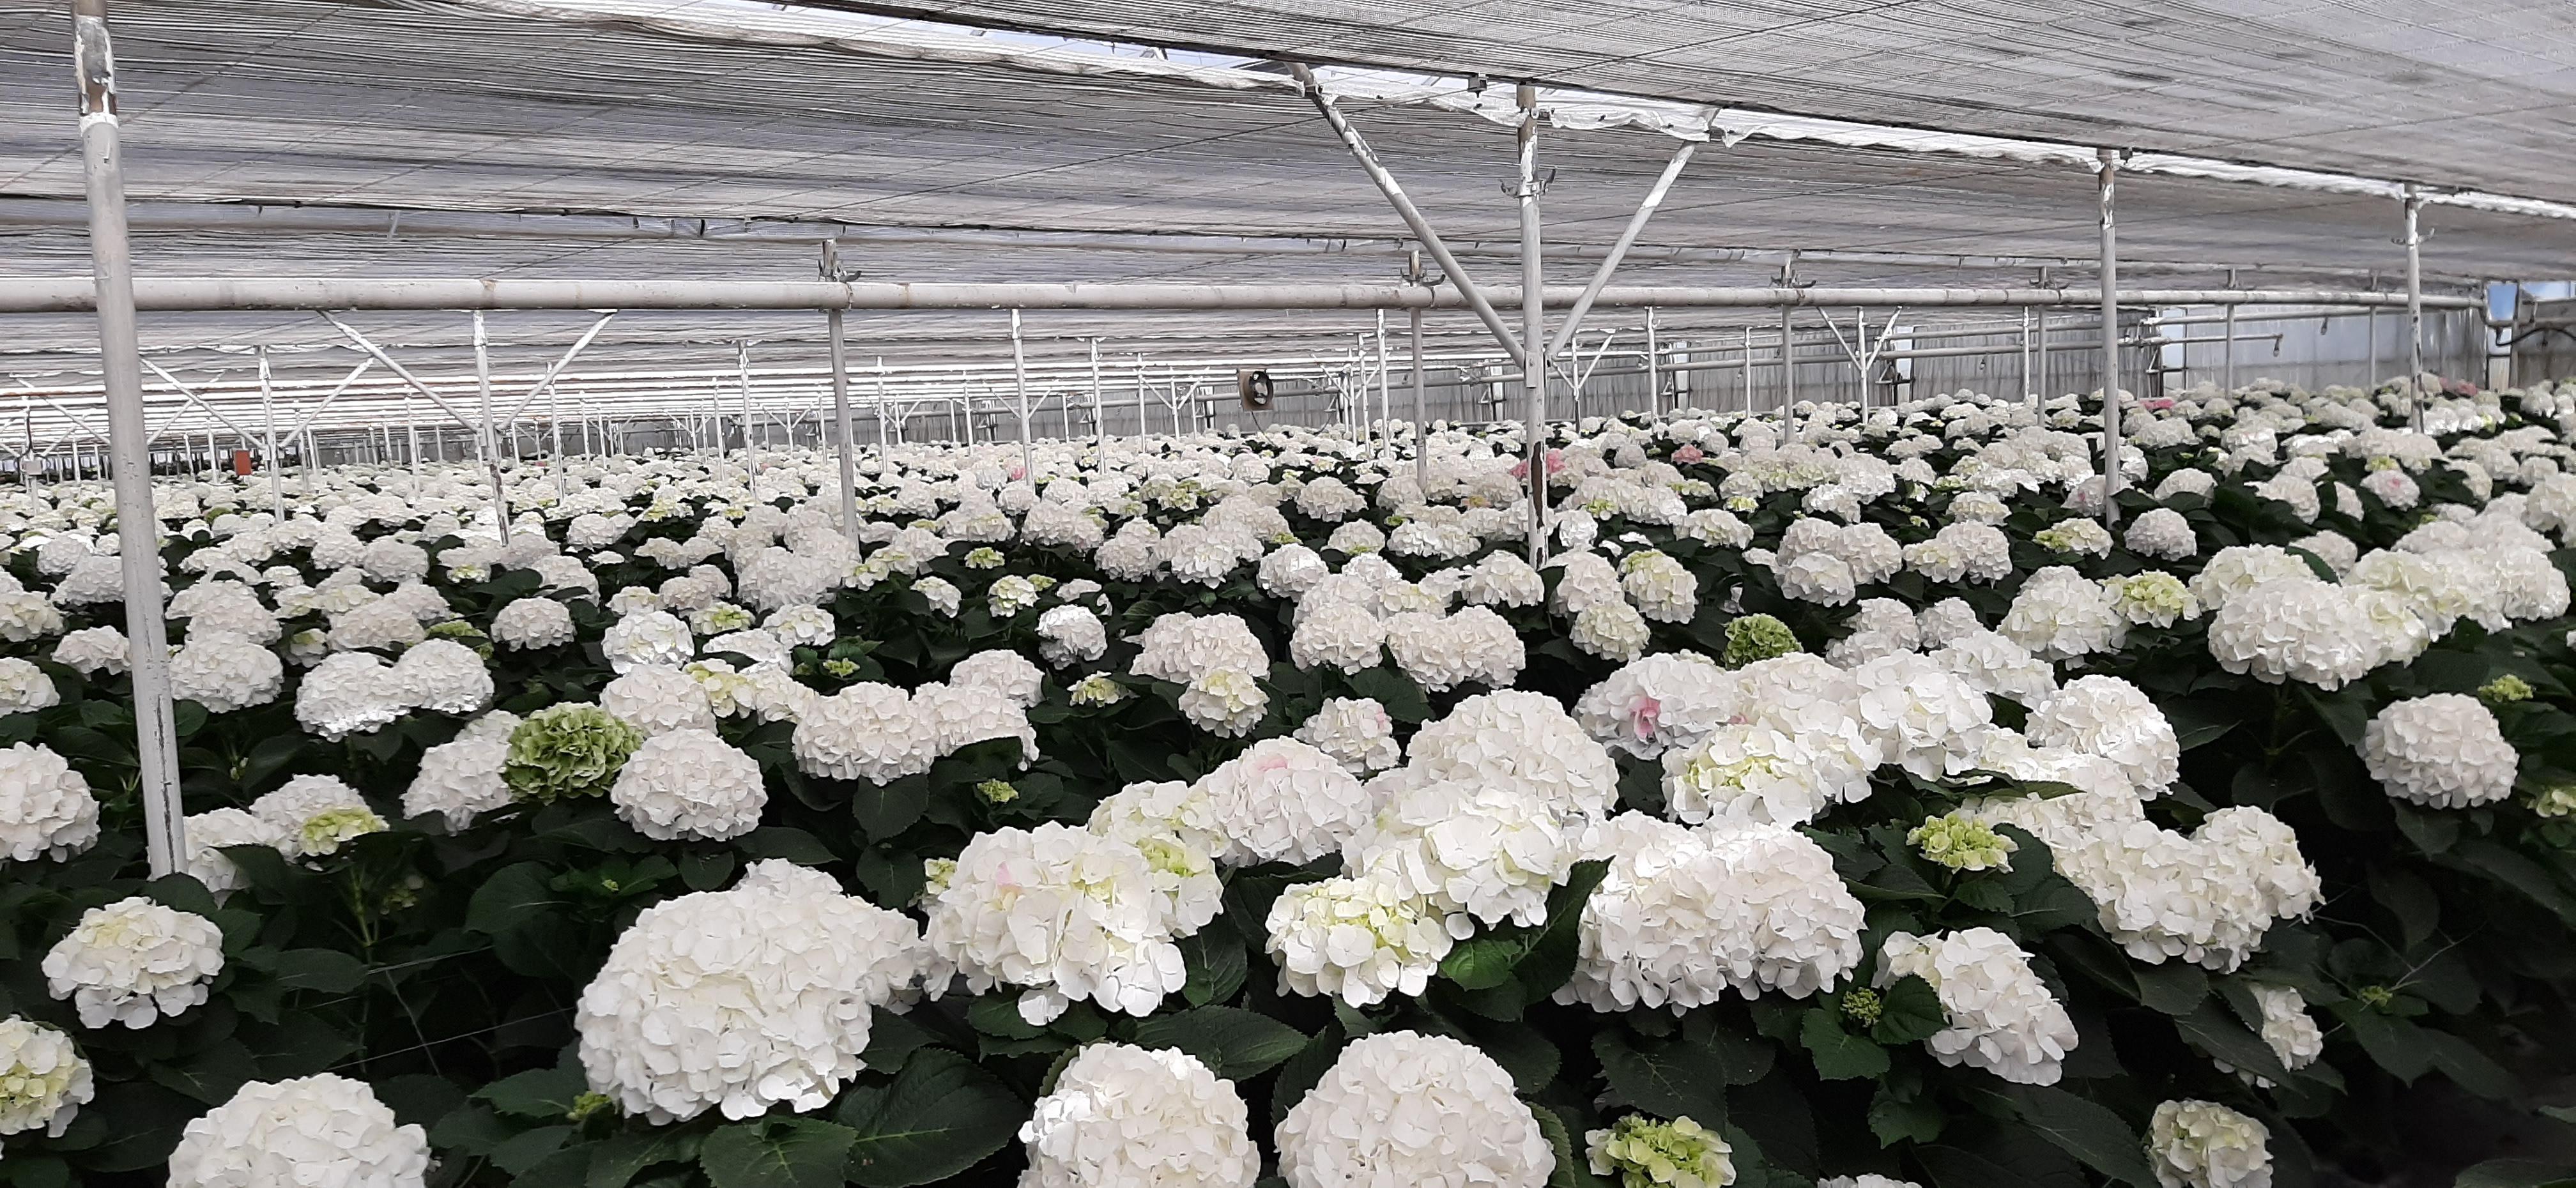 JLP Flowers/Kwekerij Borgers